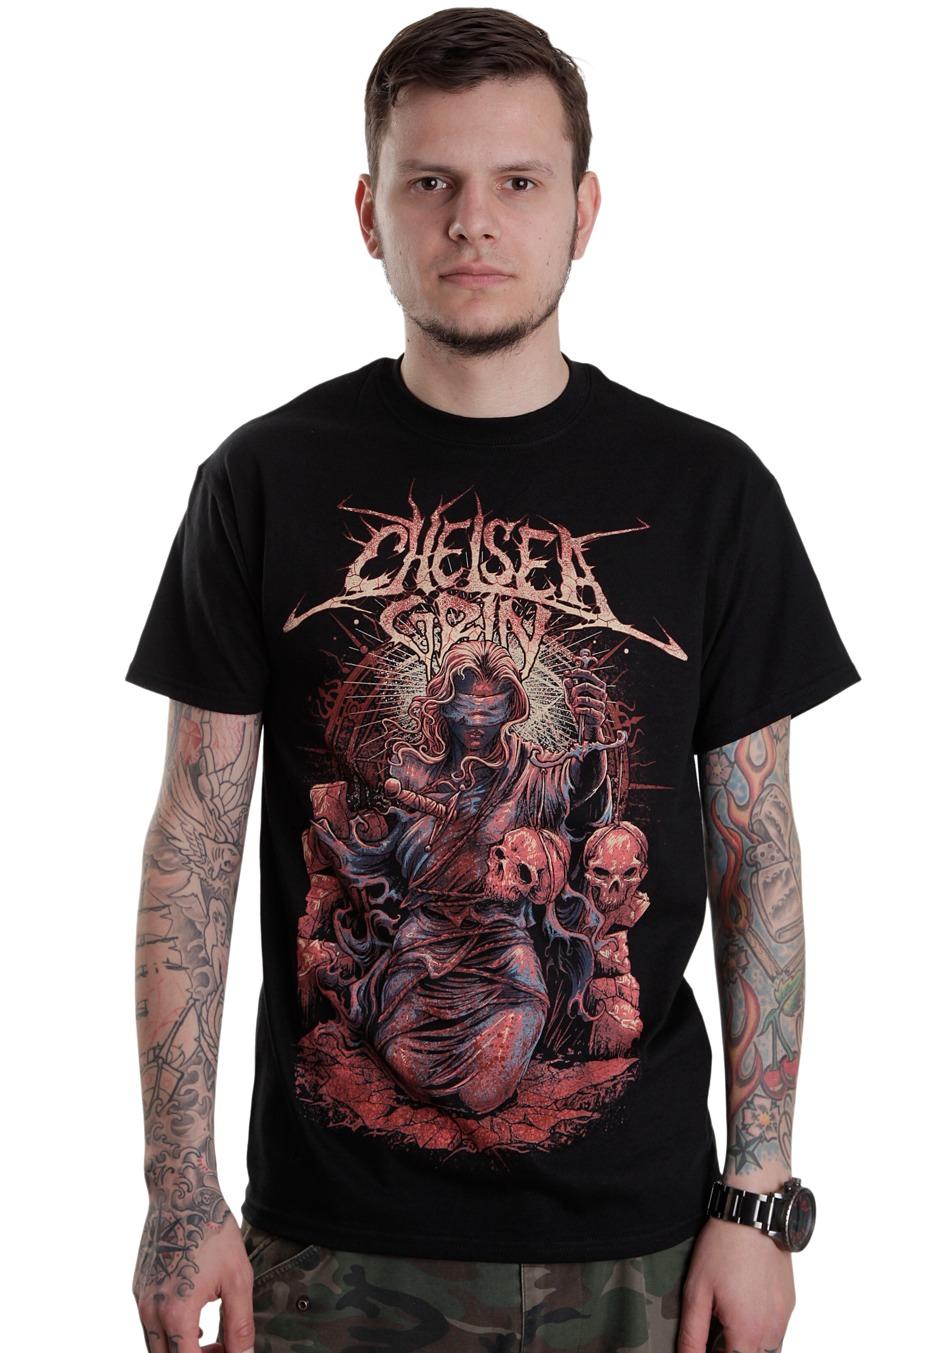 chelsea grin justice t shirt official deathcore merchandise shop uk